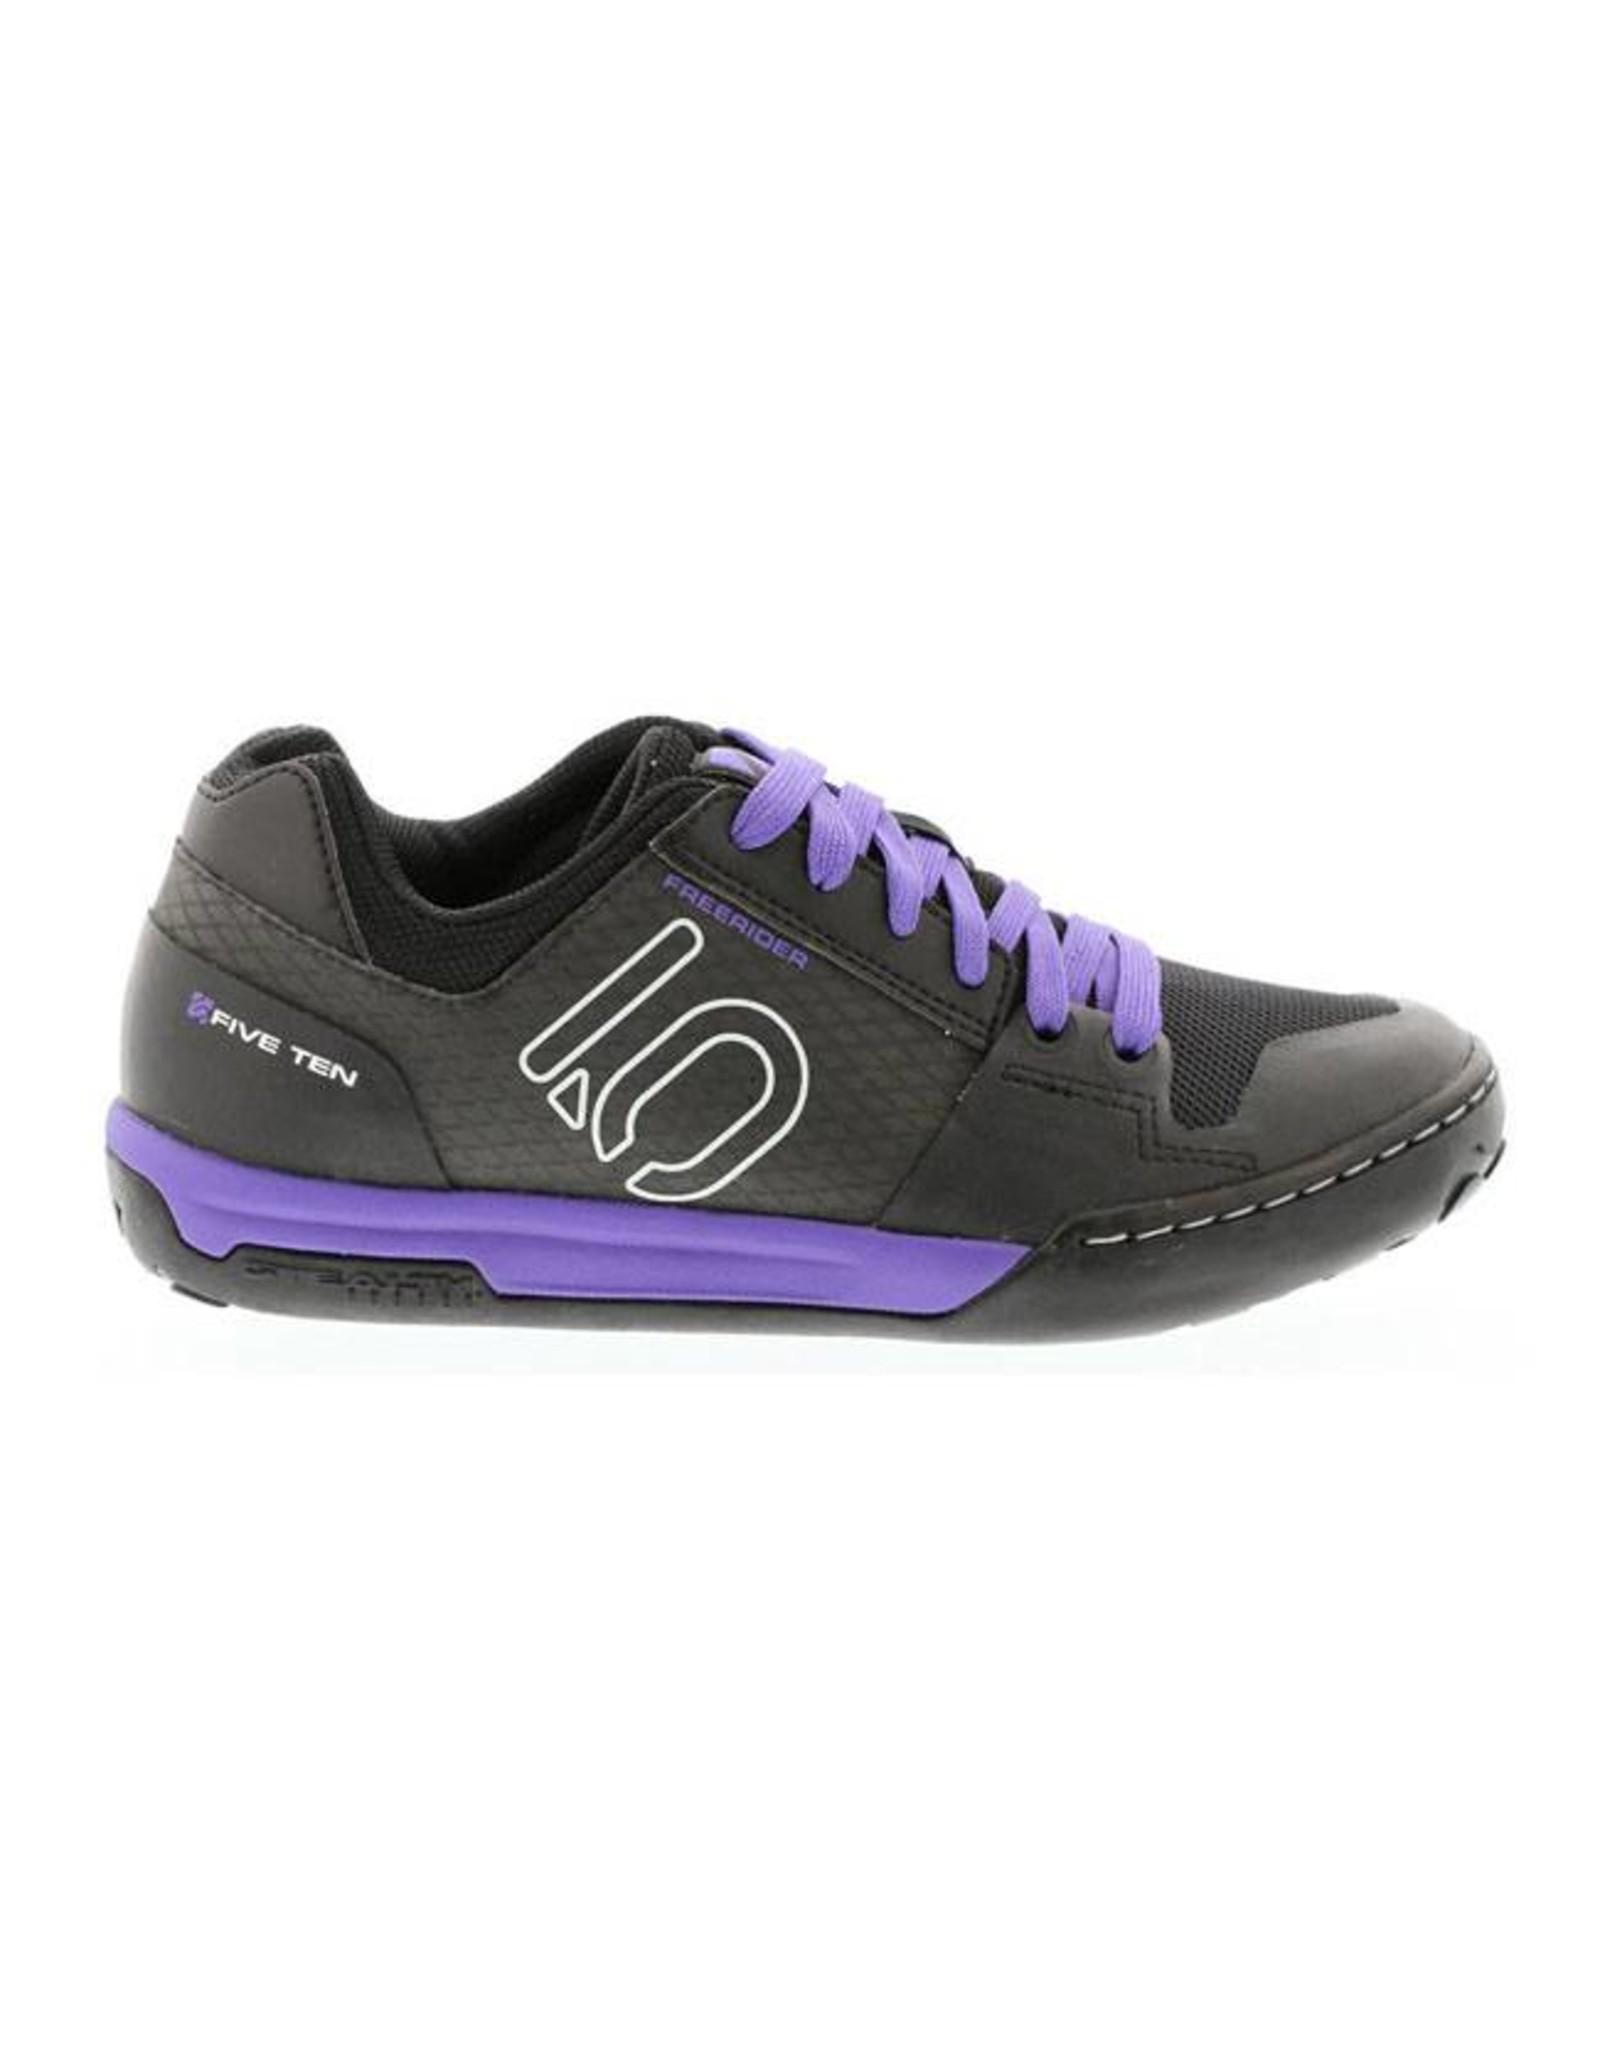 Five Ten Five Ten Freerider Contact Women's Flat Pedal Shoe: Split Purple 6.5